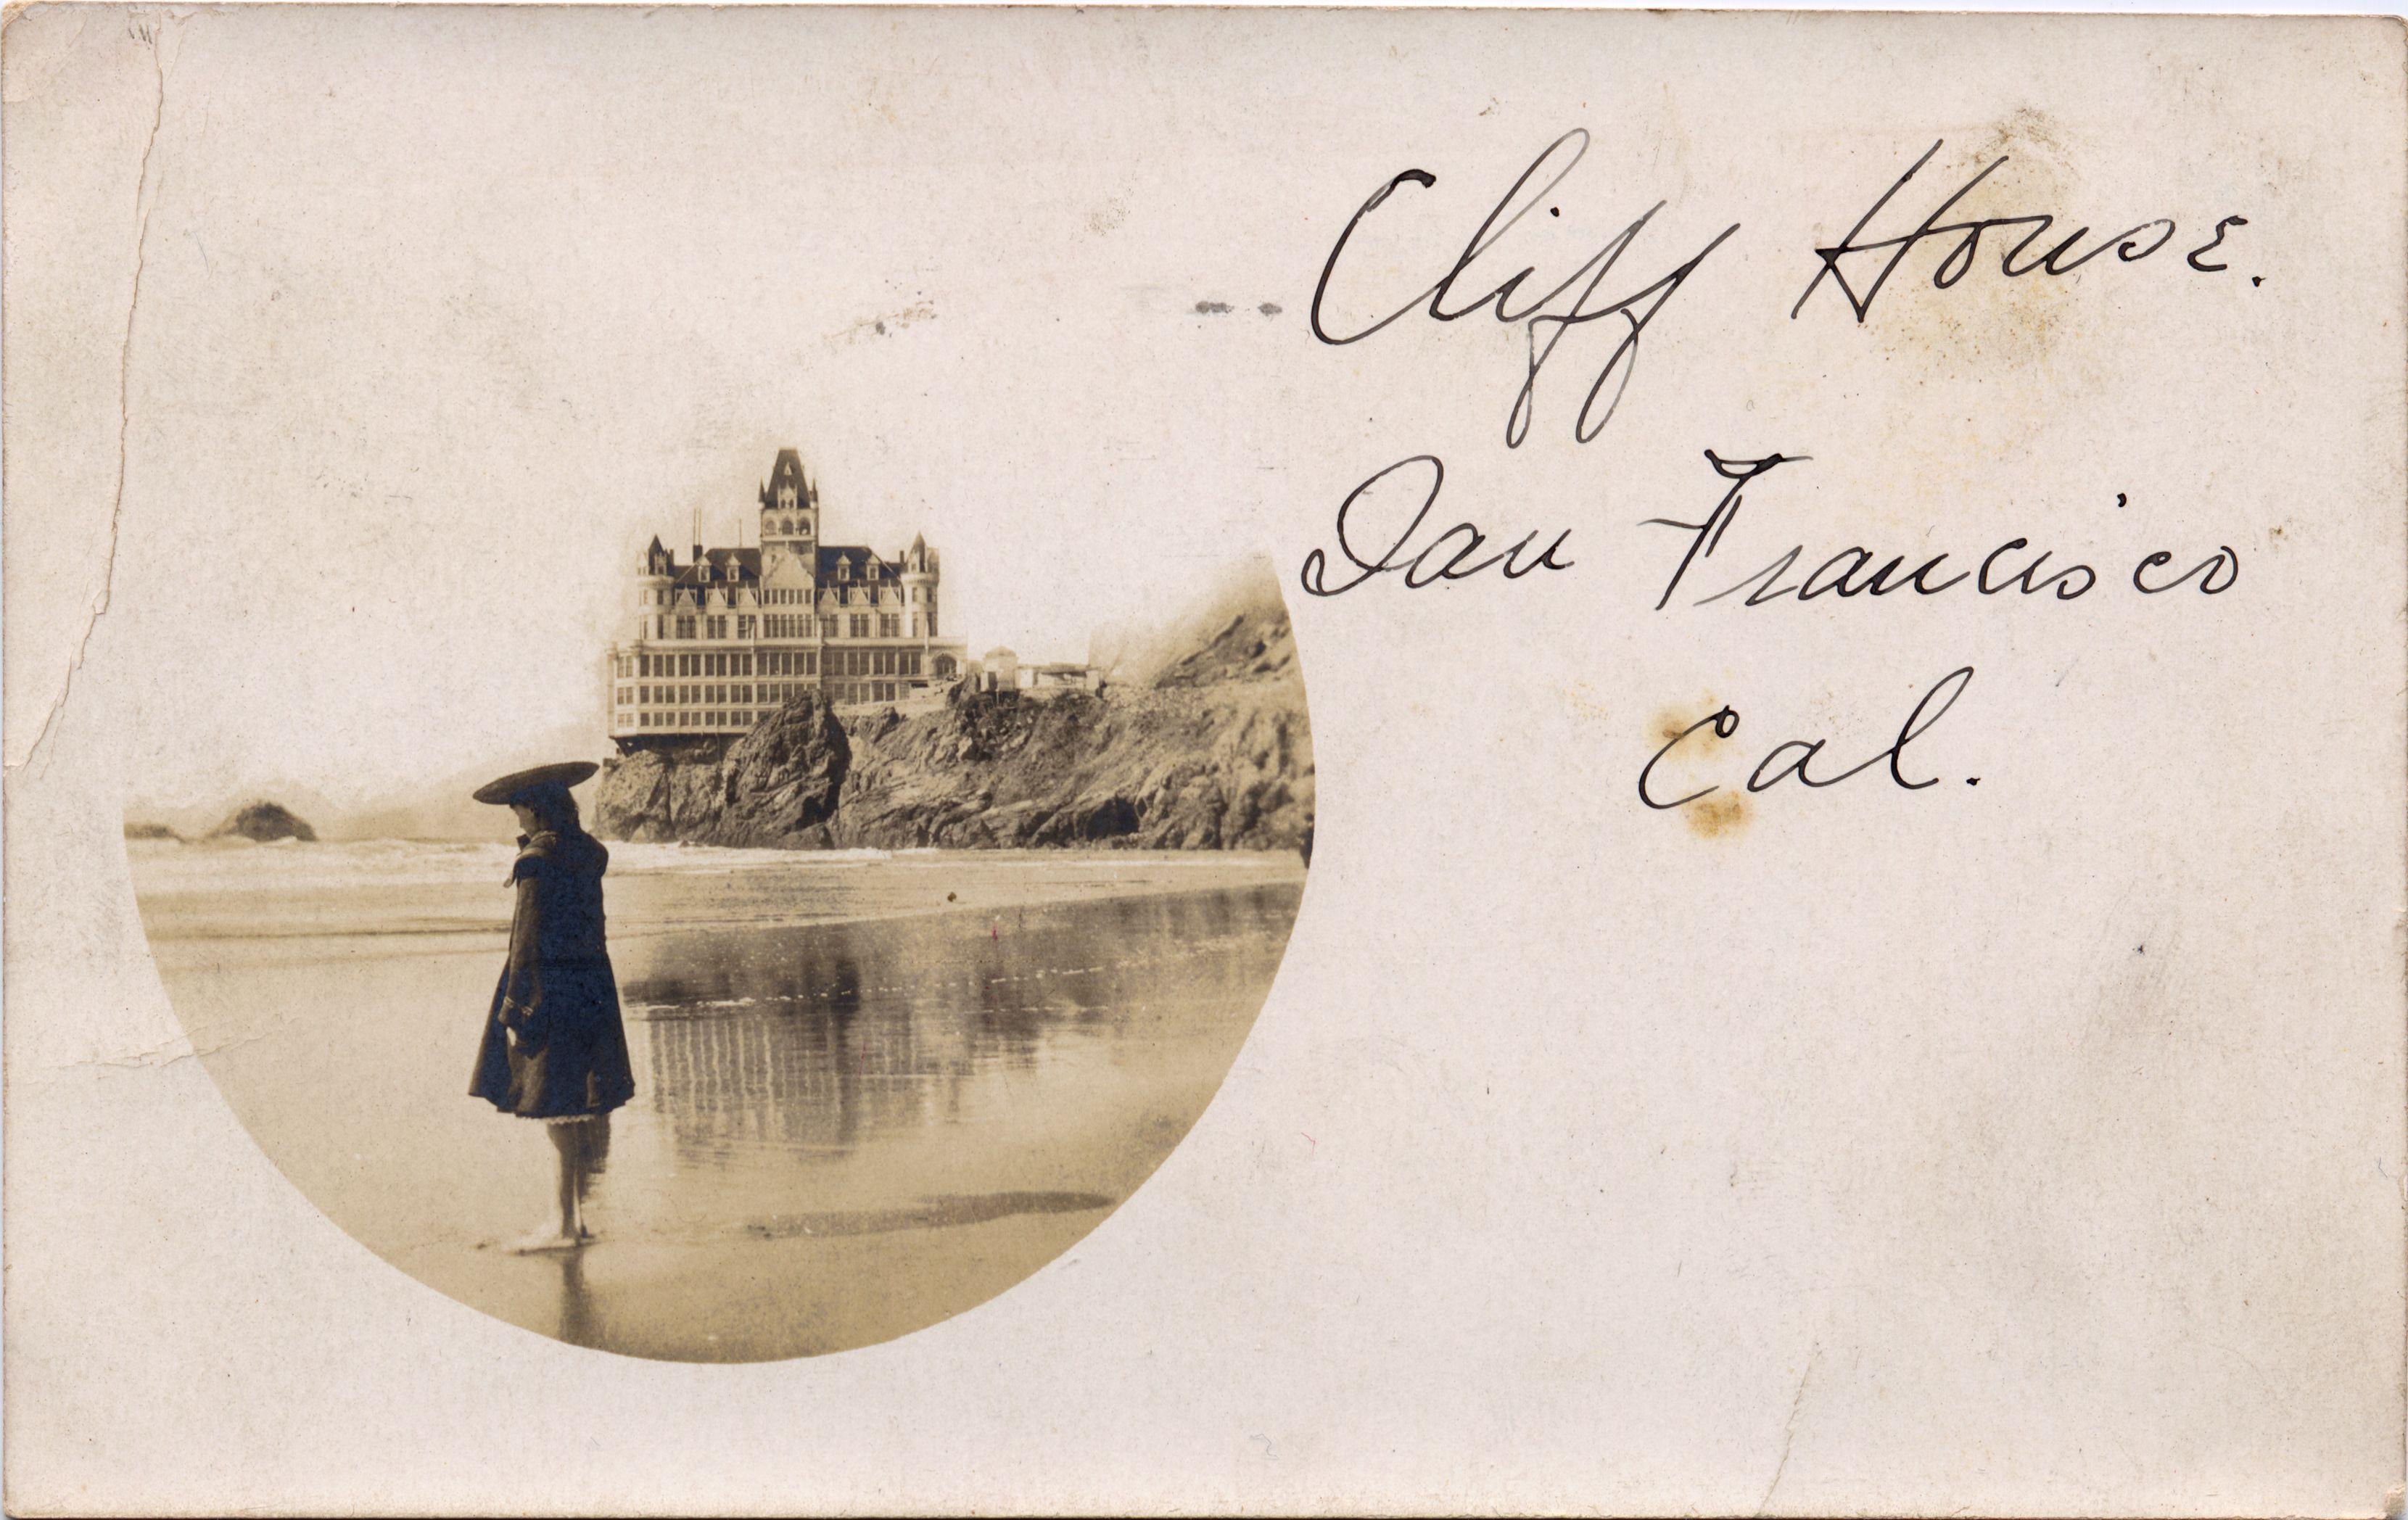 Cliff House San Francisco, CA. Postcard.